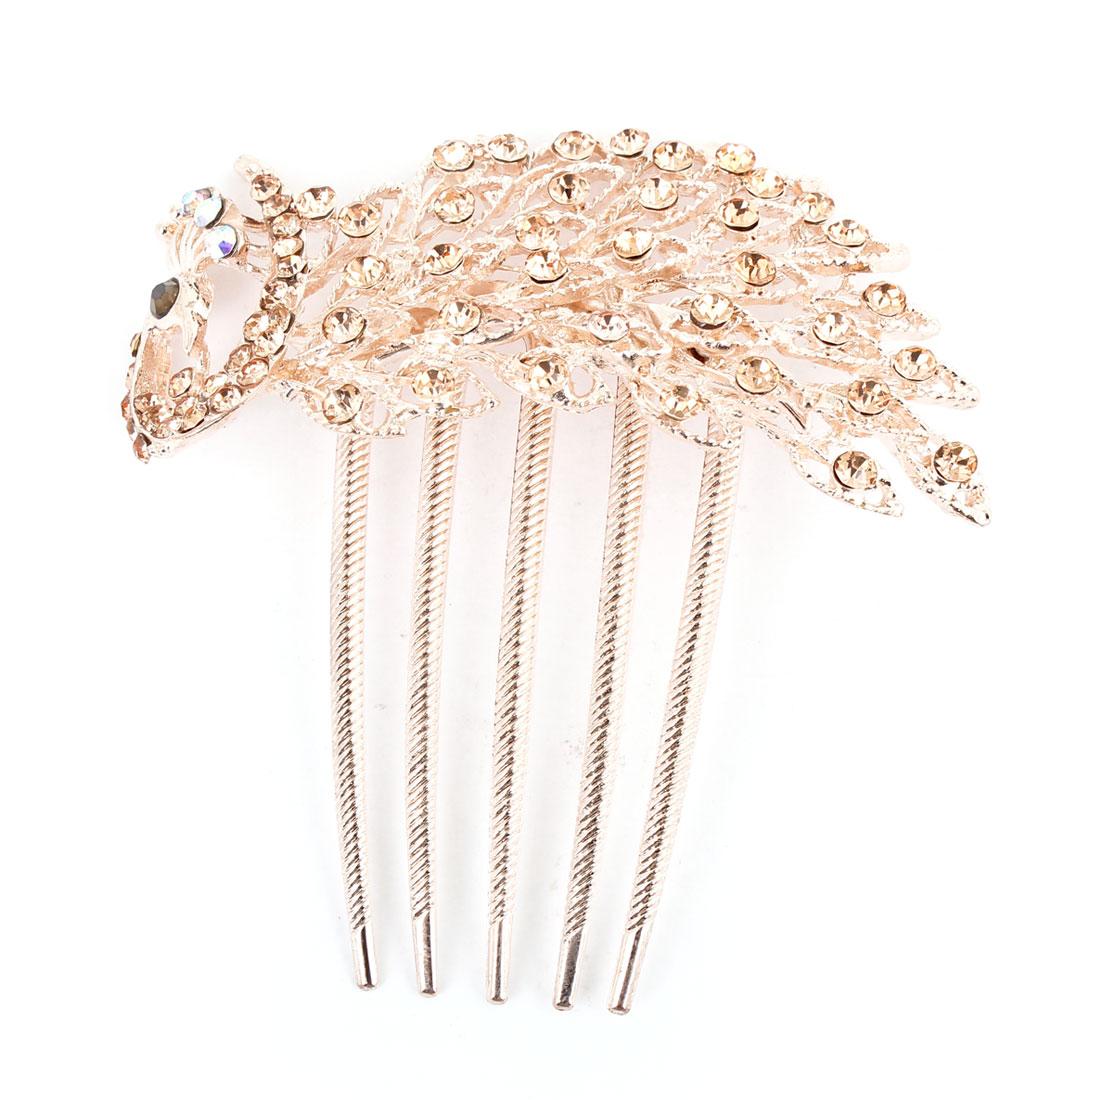 Bling Rhinestone Detail Metal Prong Peacock Hair Comb Clip Gold Tone